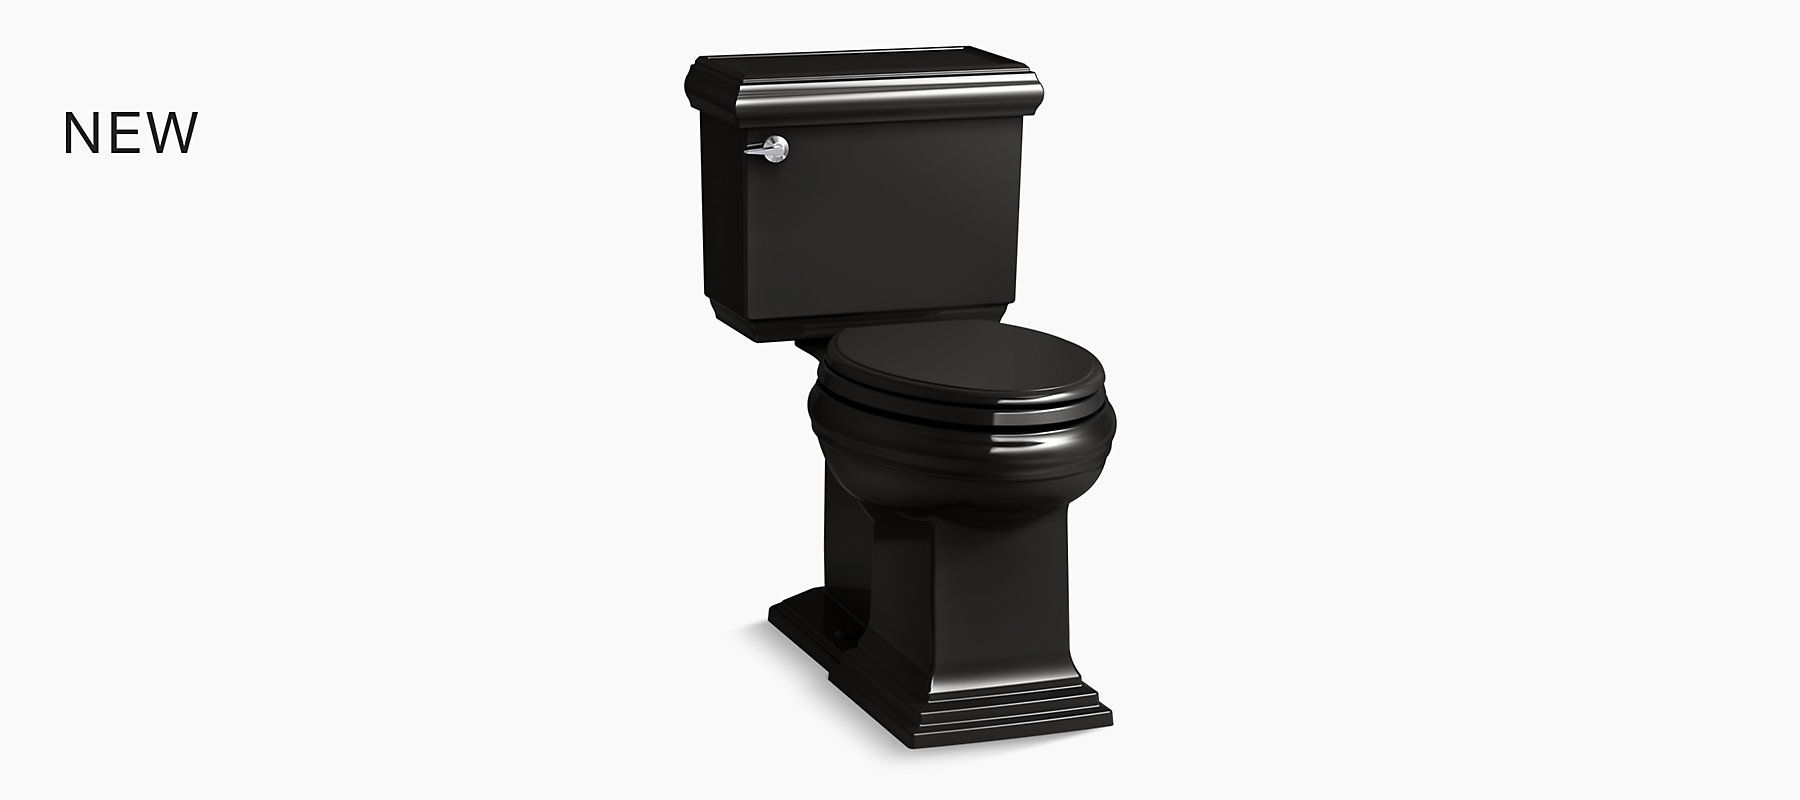 Memoirs Classic Comfort Height Elongated Toilet | K-6999 | KOHLER